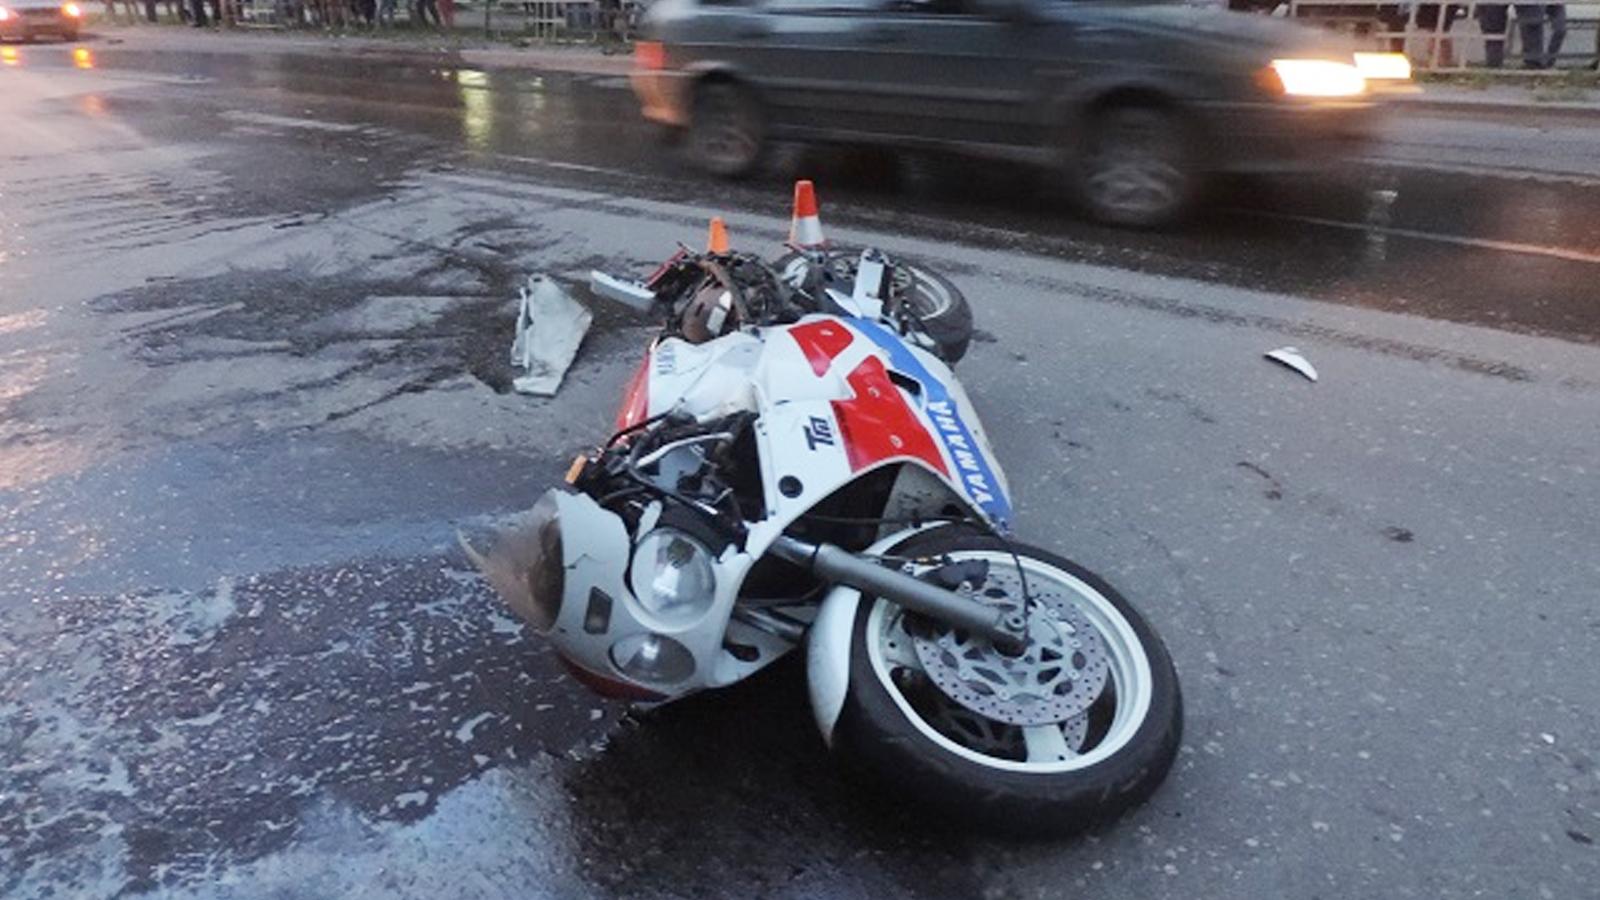 26-летний мотоциклист погиб в ДТП в Соколе